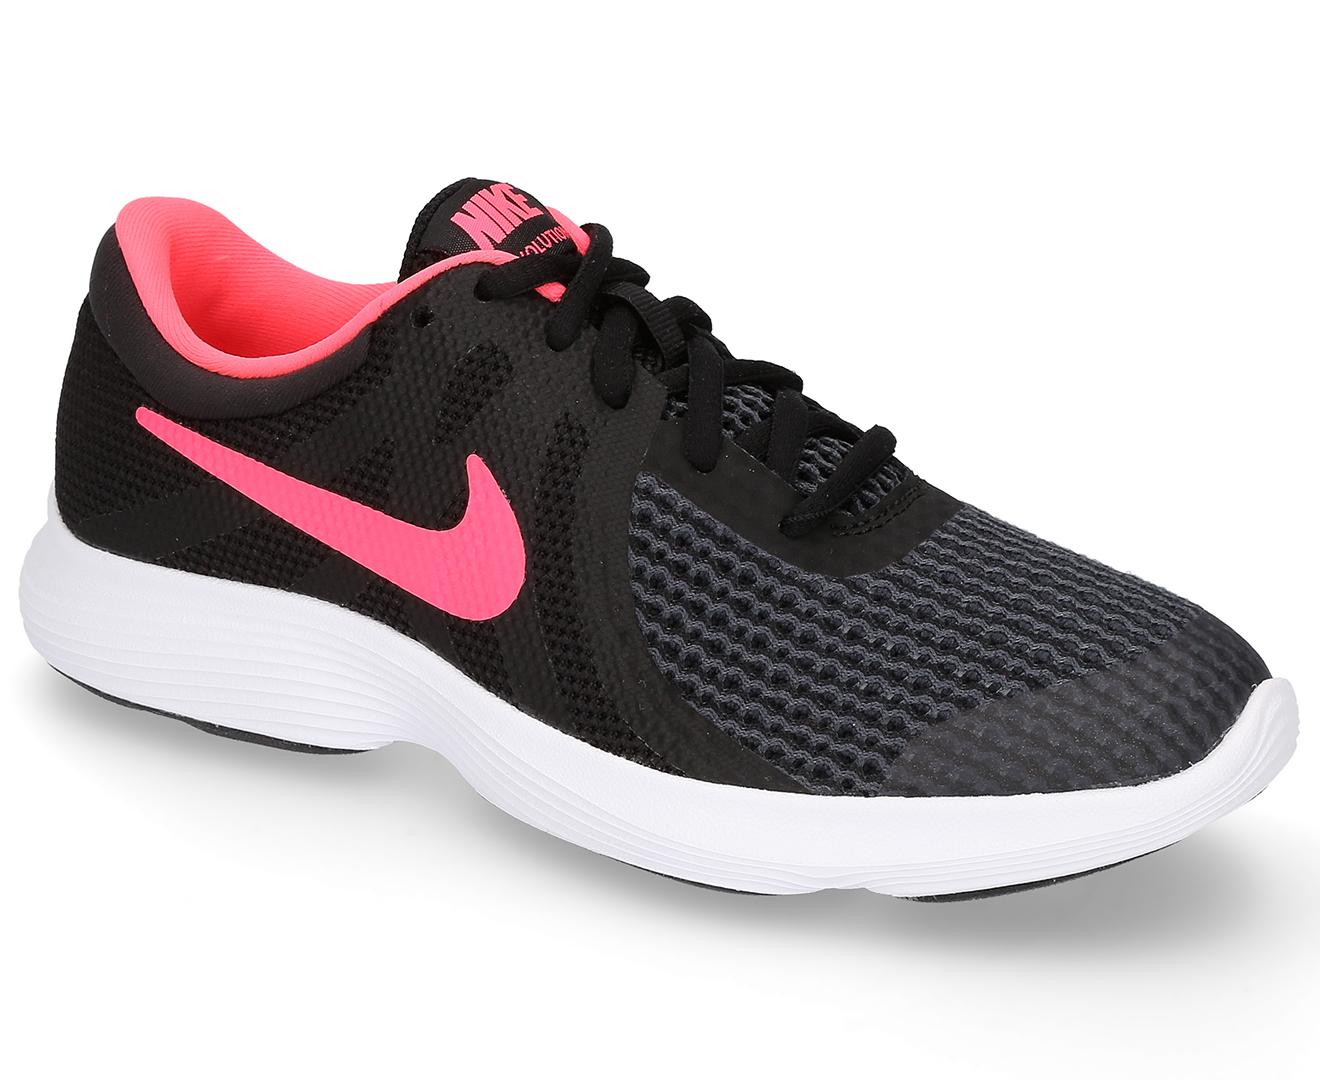 aa2f1e75f1e45 Nike Girls  Grade School Revolution 4 Shoe - Black Racer Pink-White ...